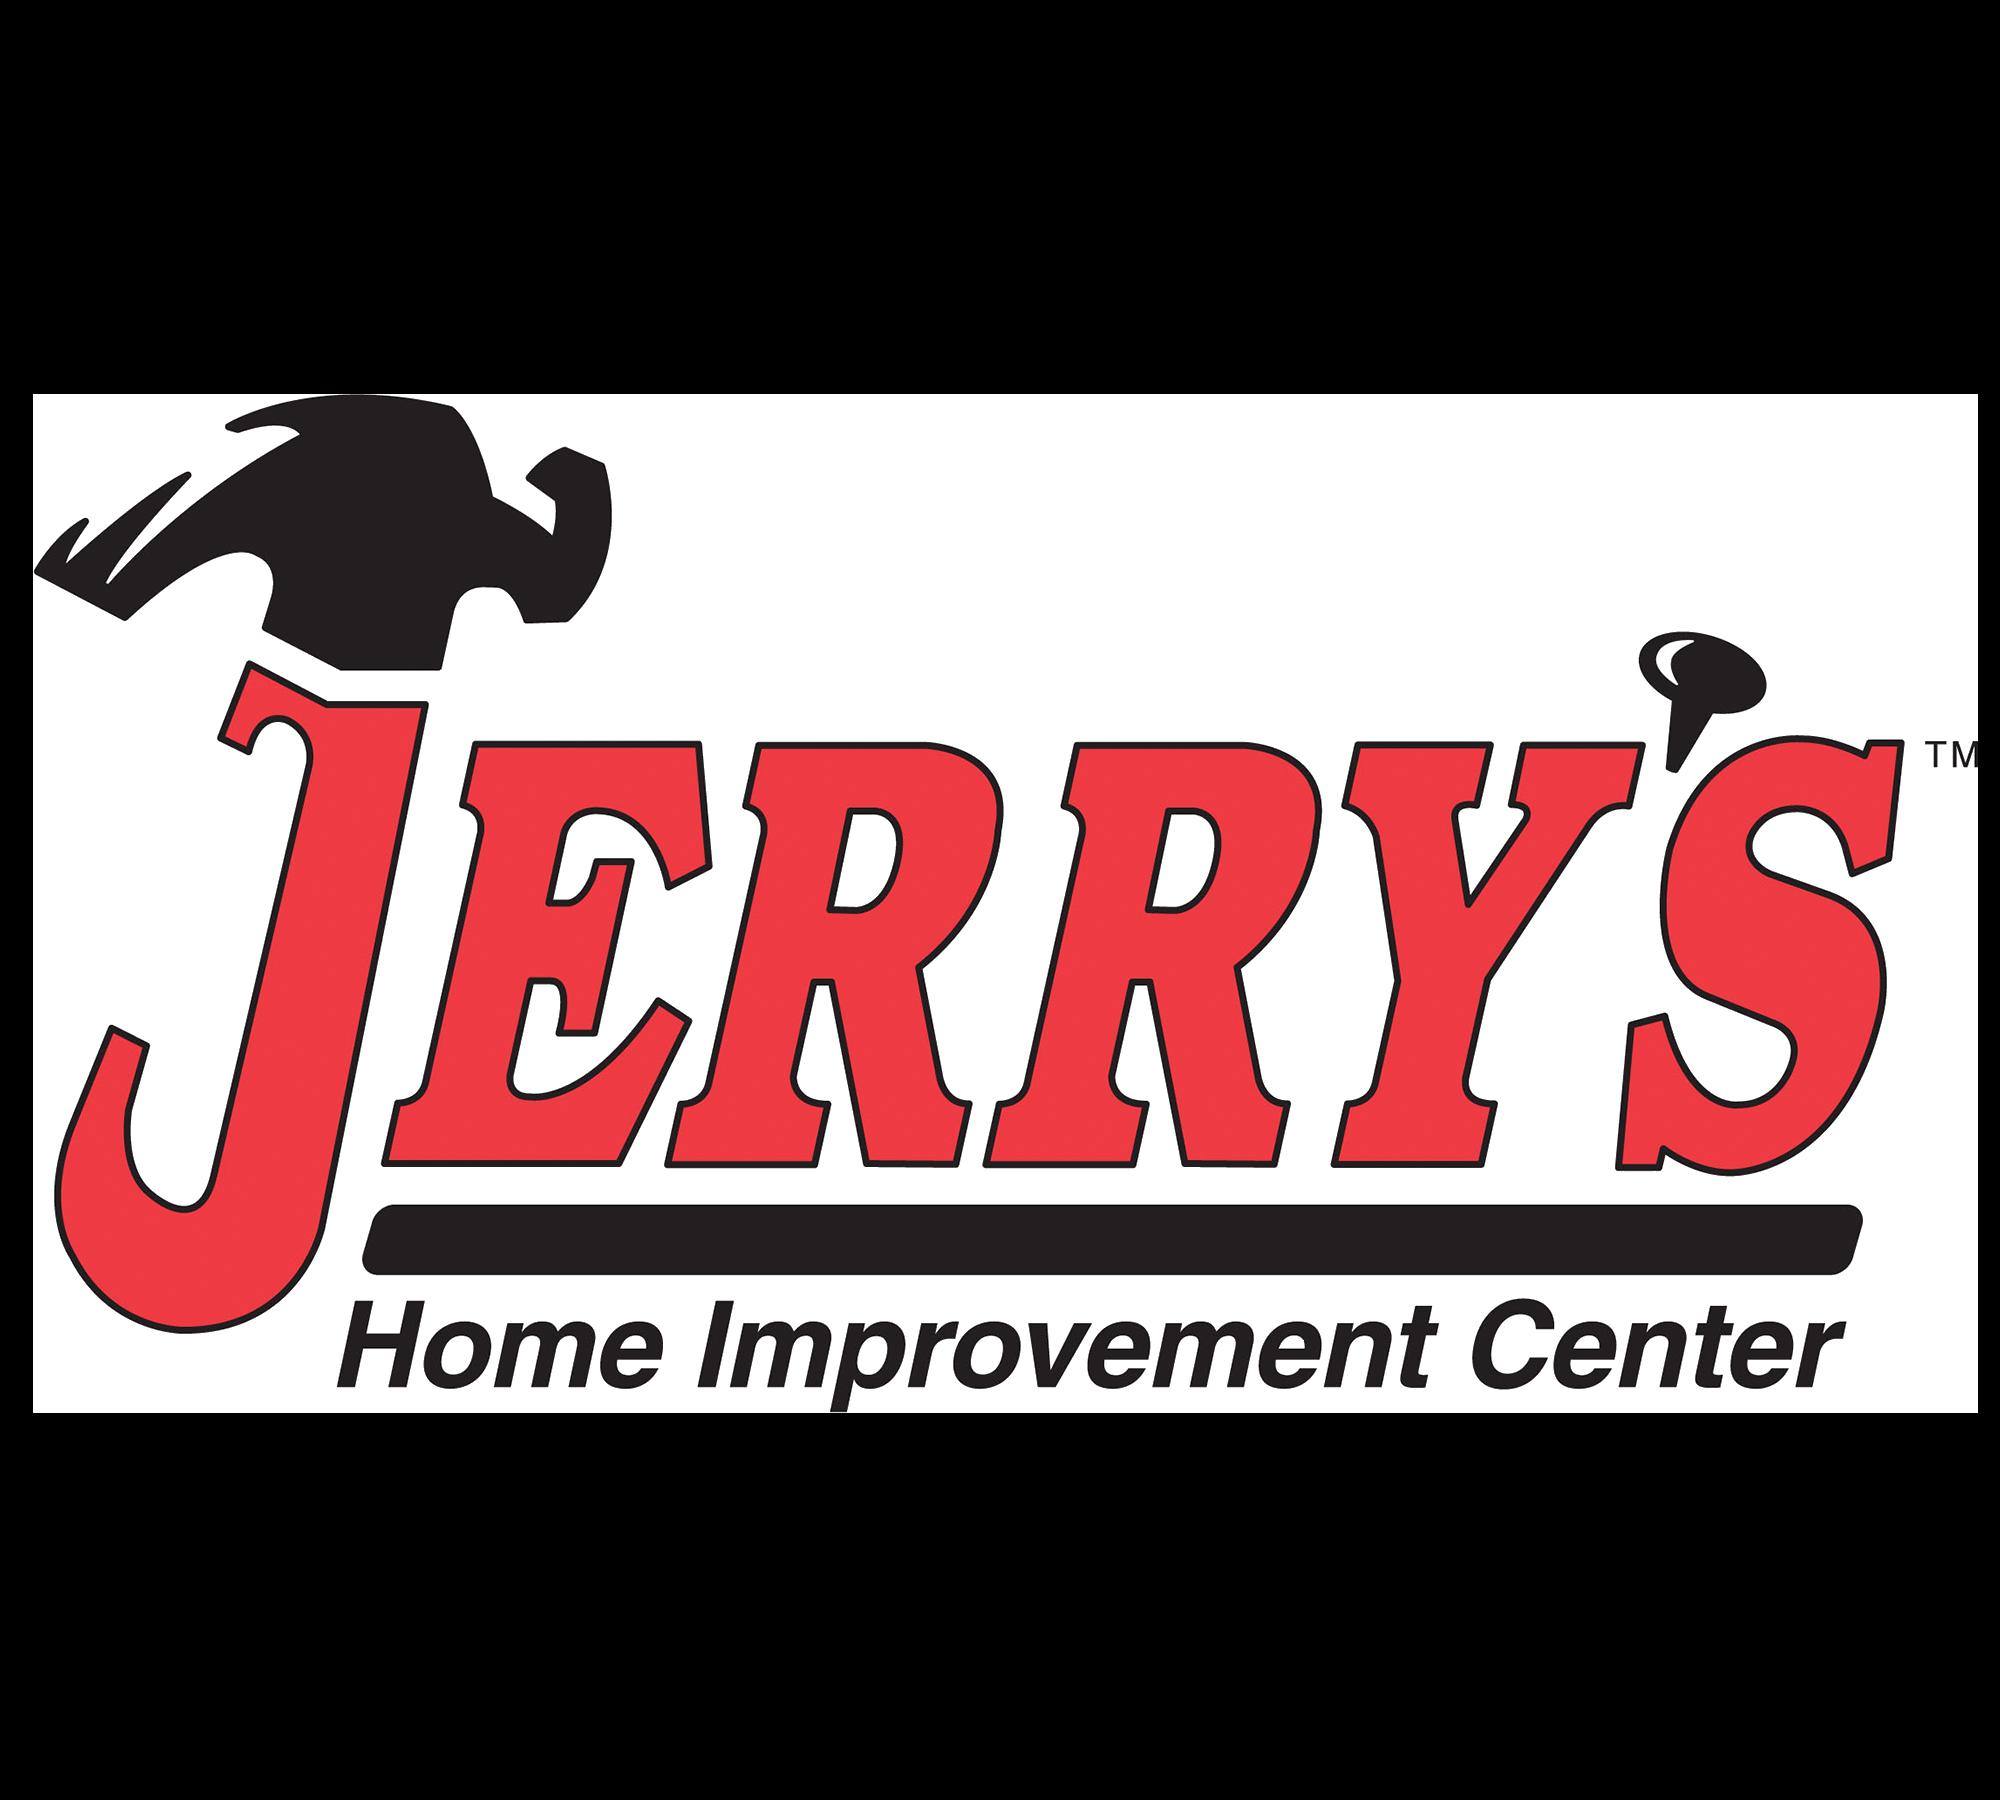 Jerry's Home Improvement Center